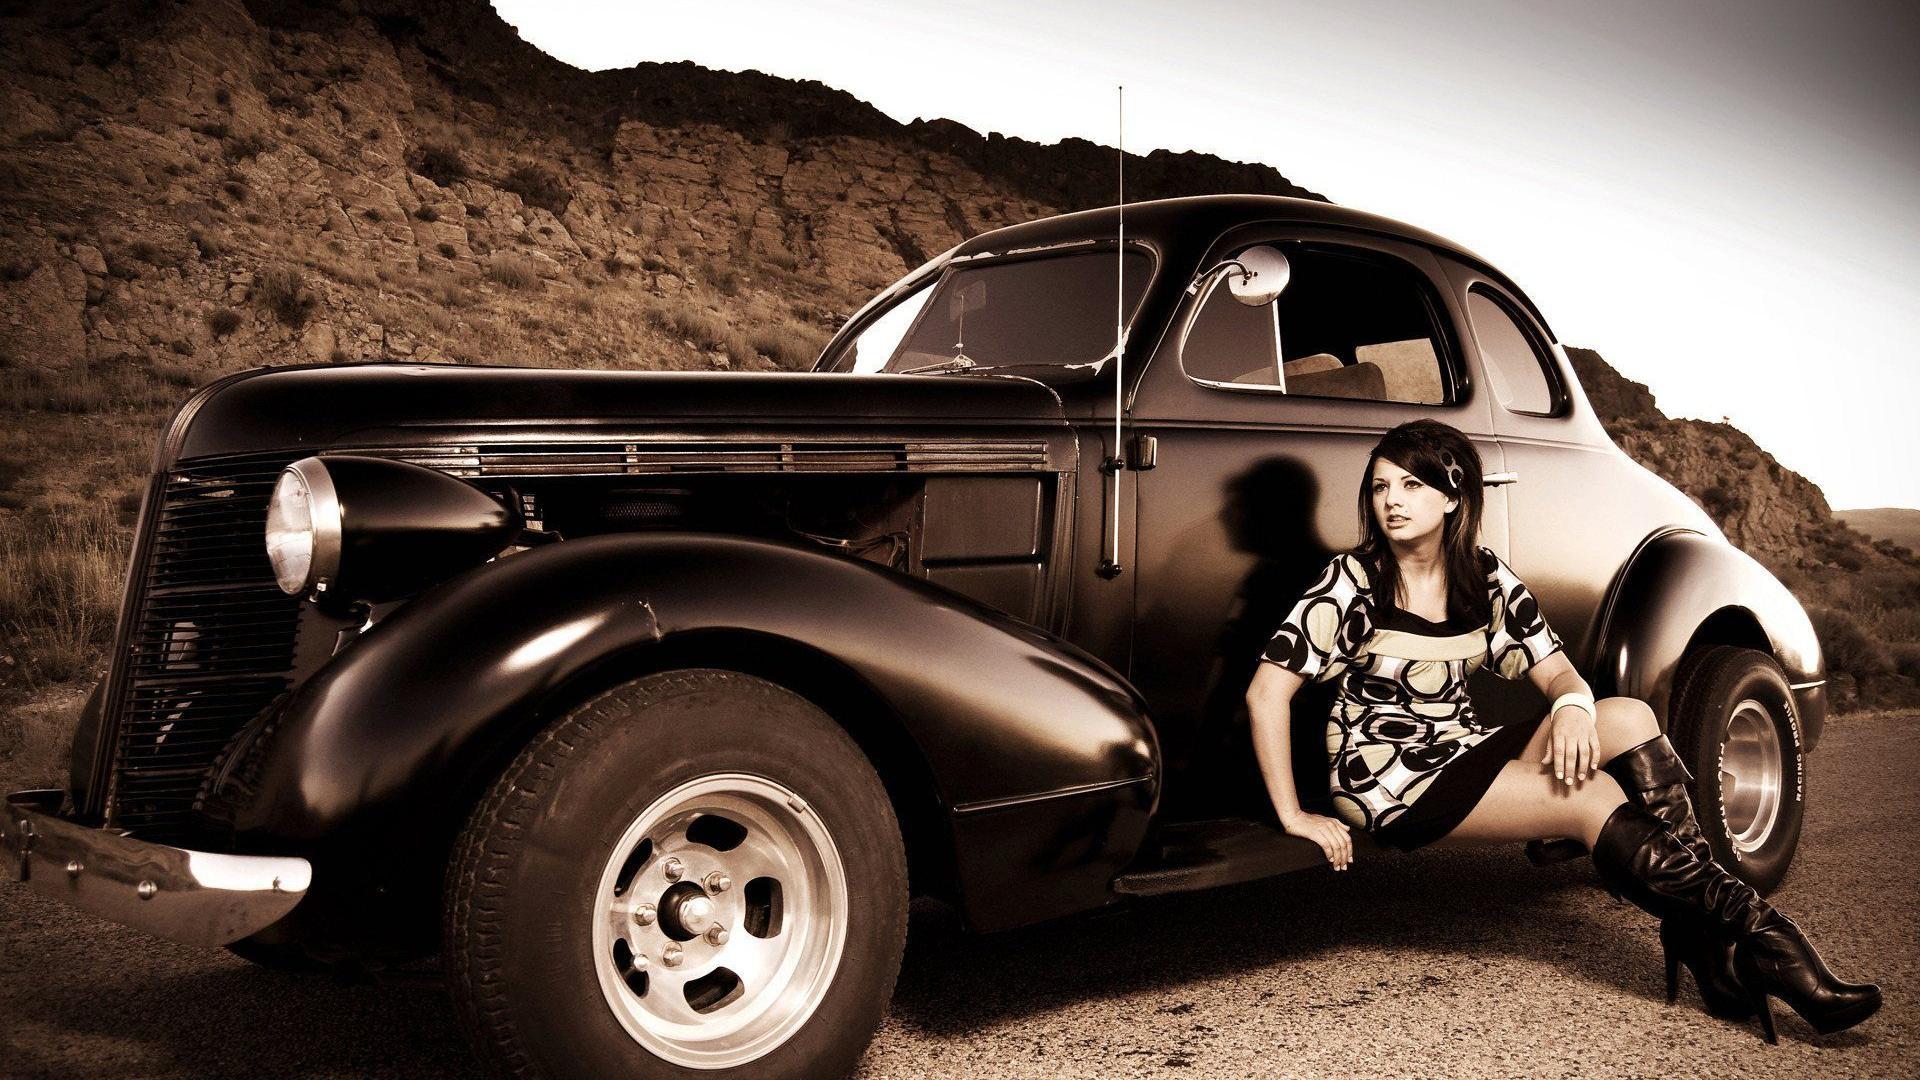 Vintage Car Backgrounds HD Wallpaper 1920x1080